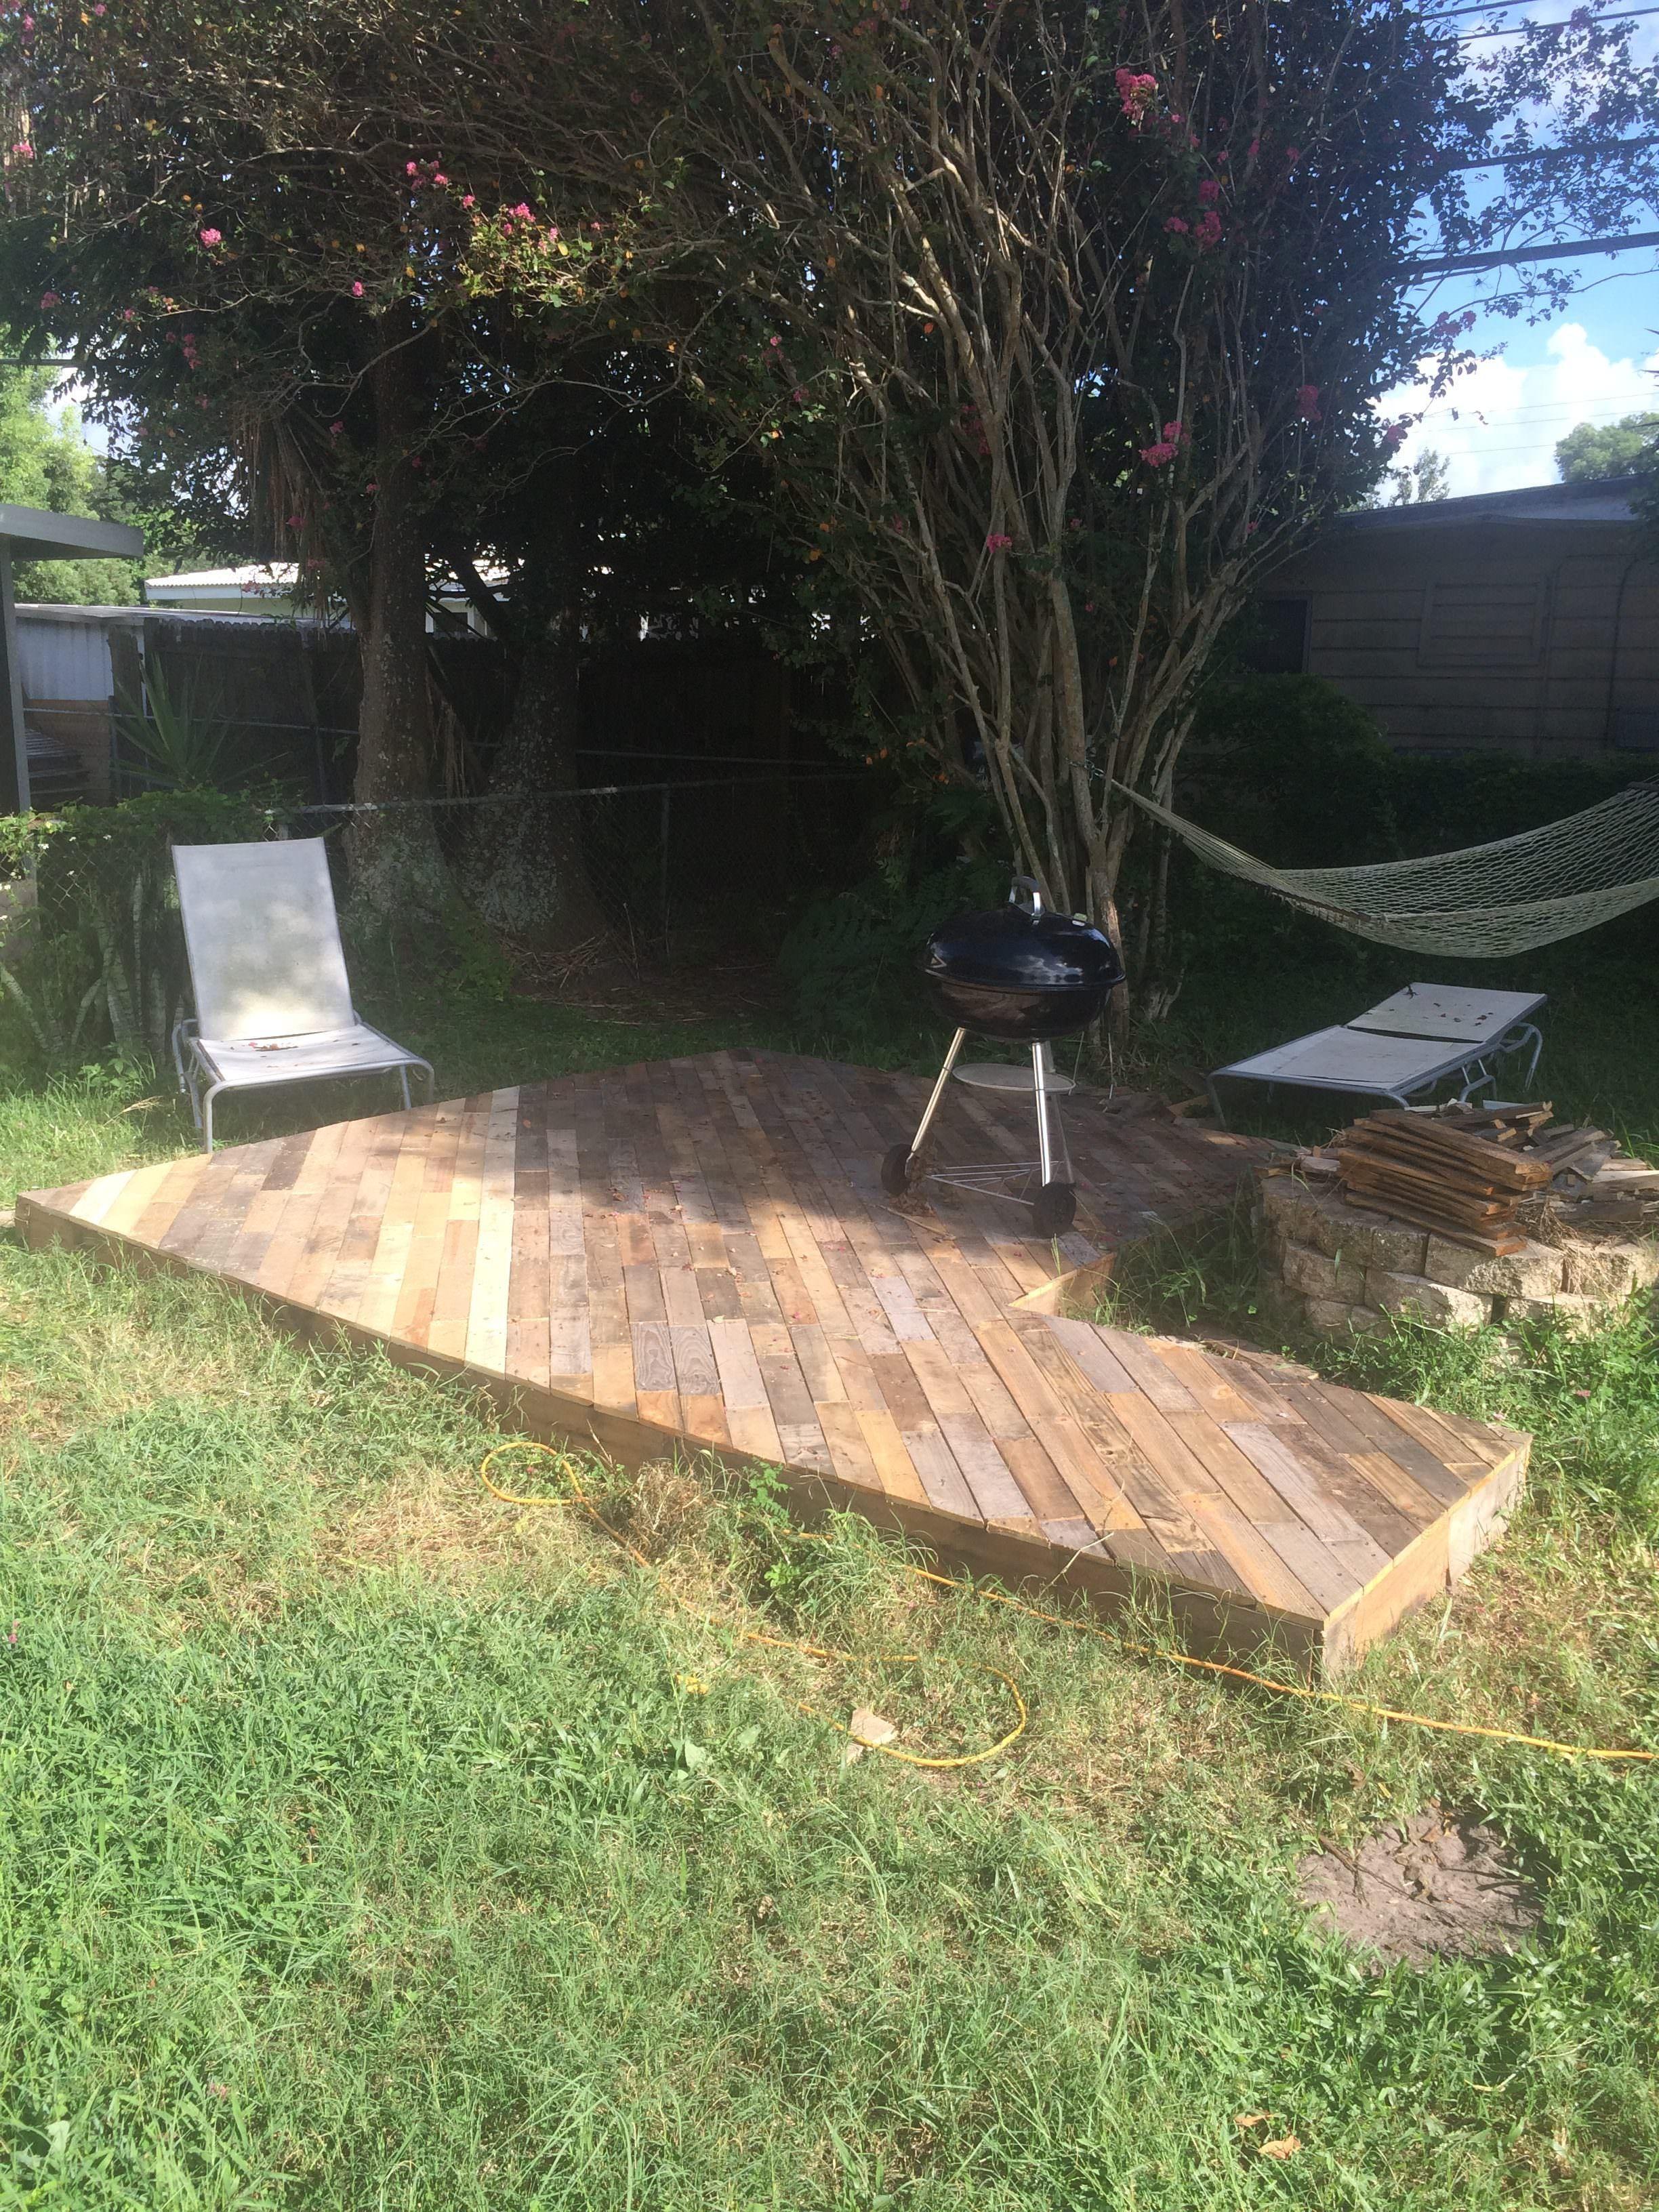 Patio Deck Out Of 16 Wooden Pallets • 16 Pallets  Pallet patio